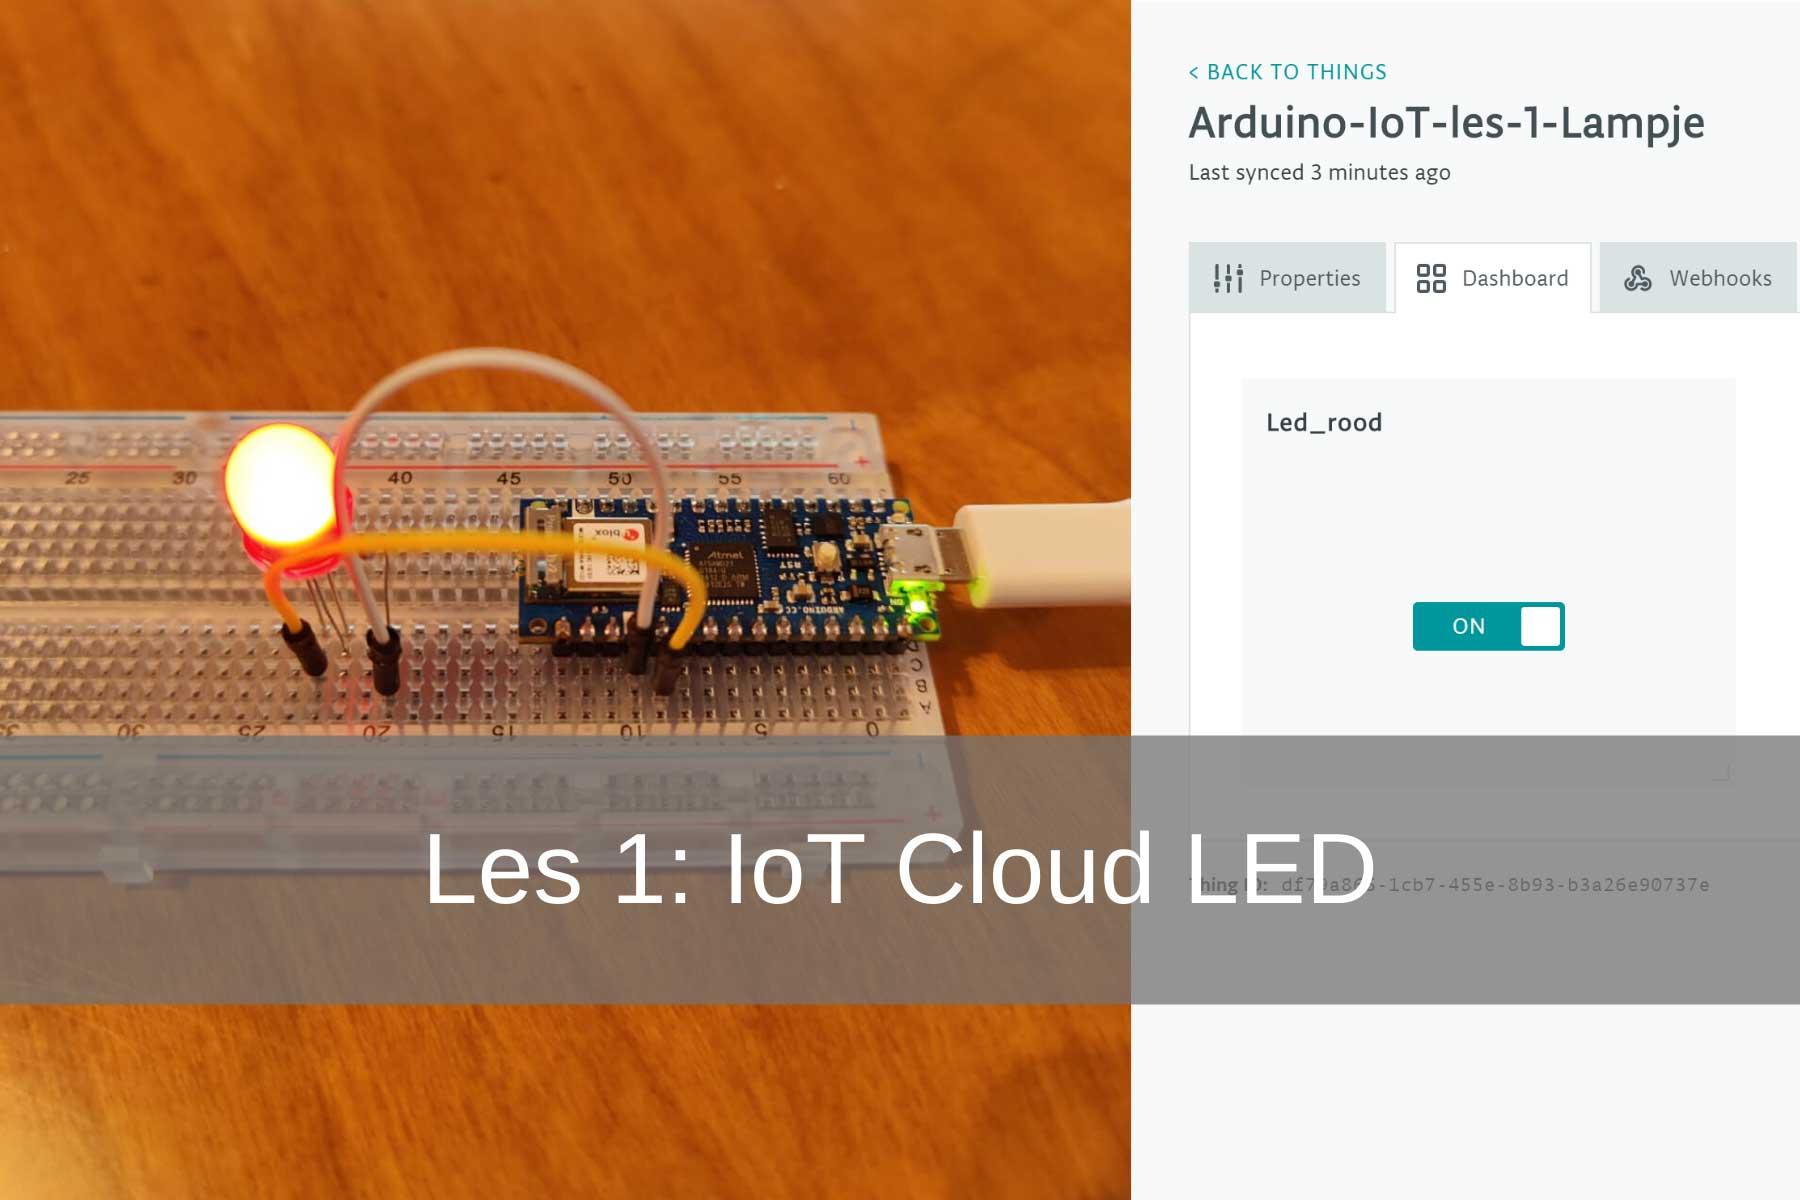 Arduino IoT Cloud Les 1: LED Lampje